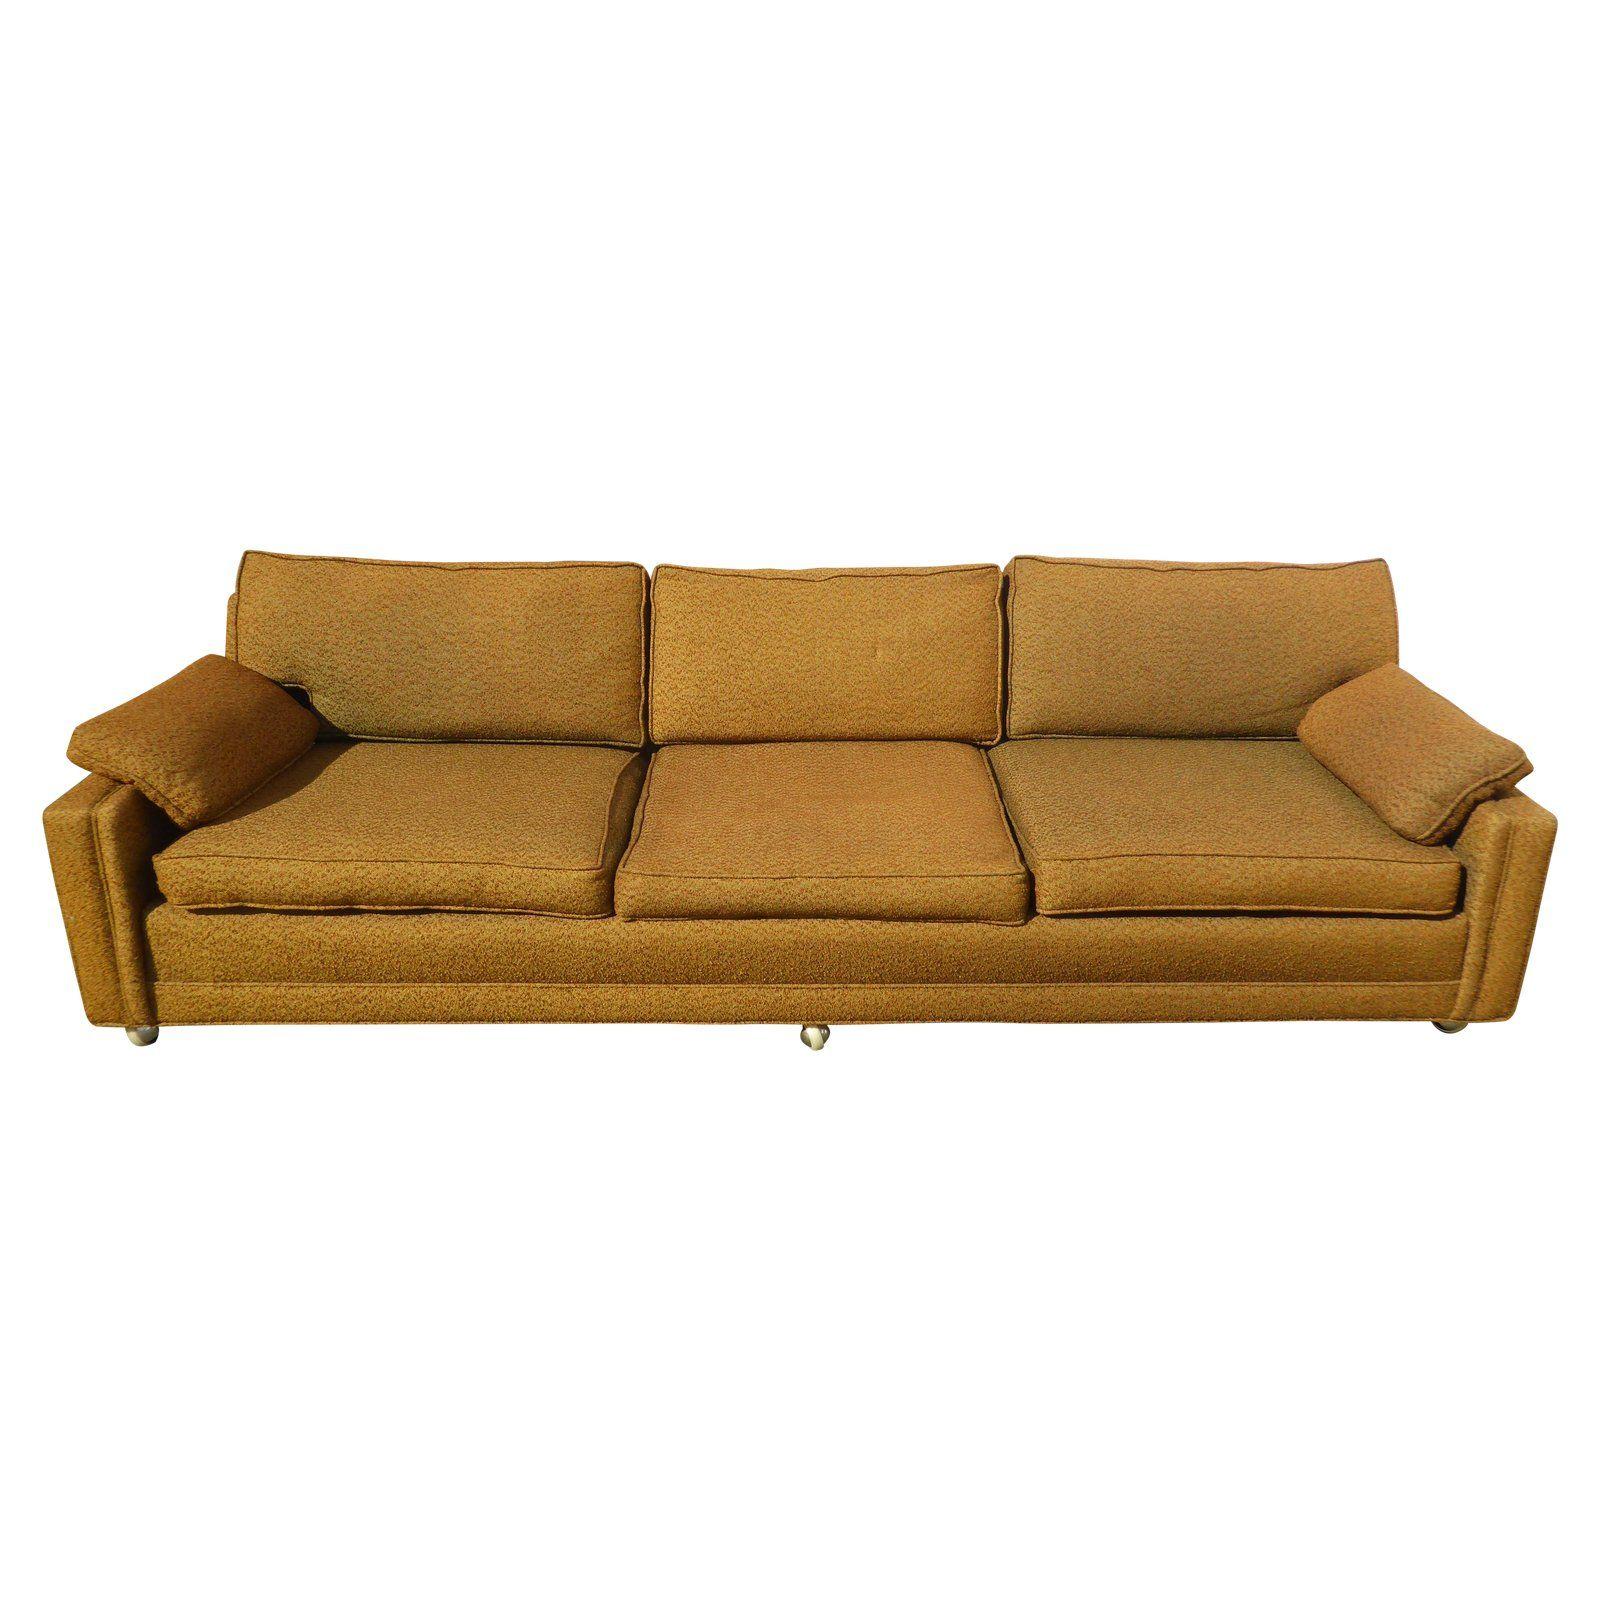 Mid Century Modern Gold Sofa On Castors For Sale Gold Sofa